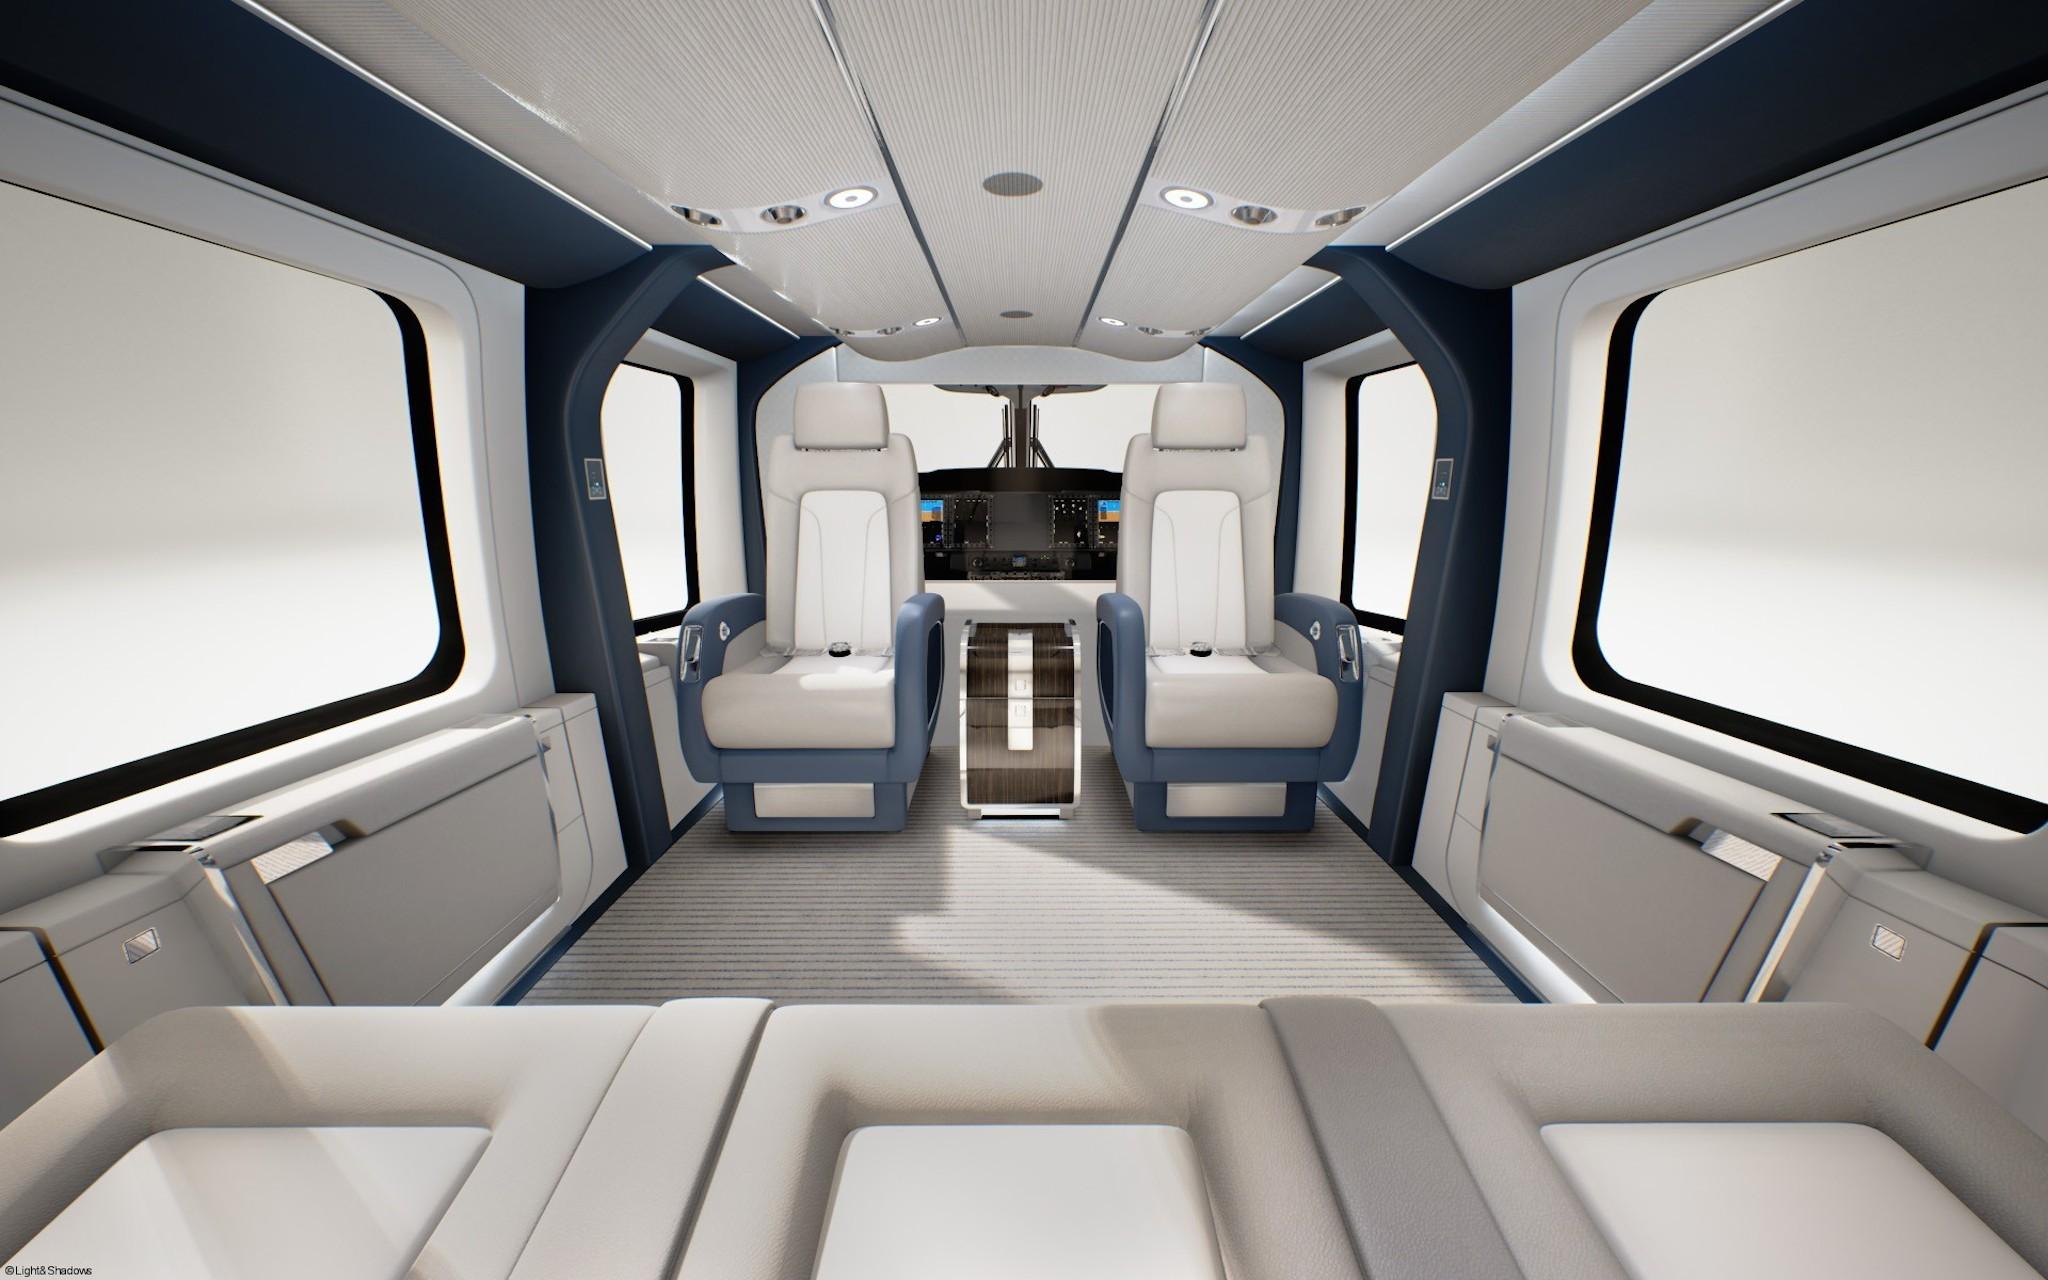 intérieur du H160 VIP - Airbus Helicopters